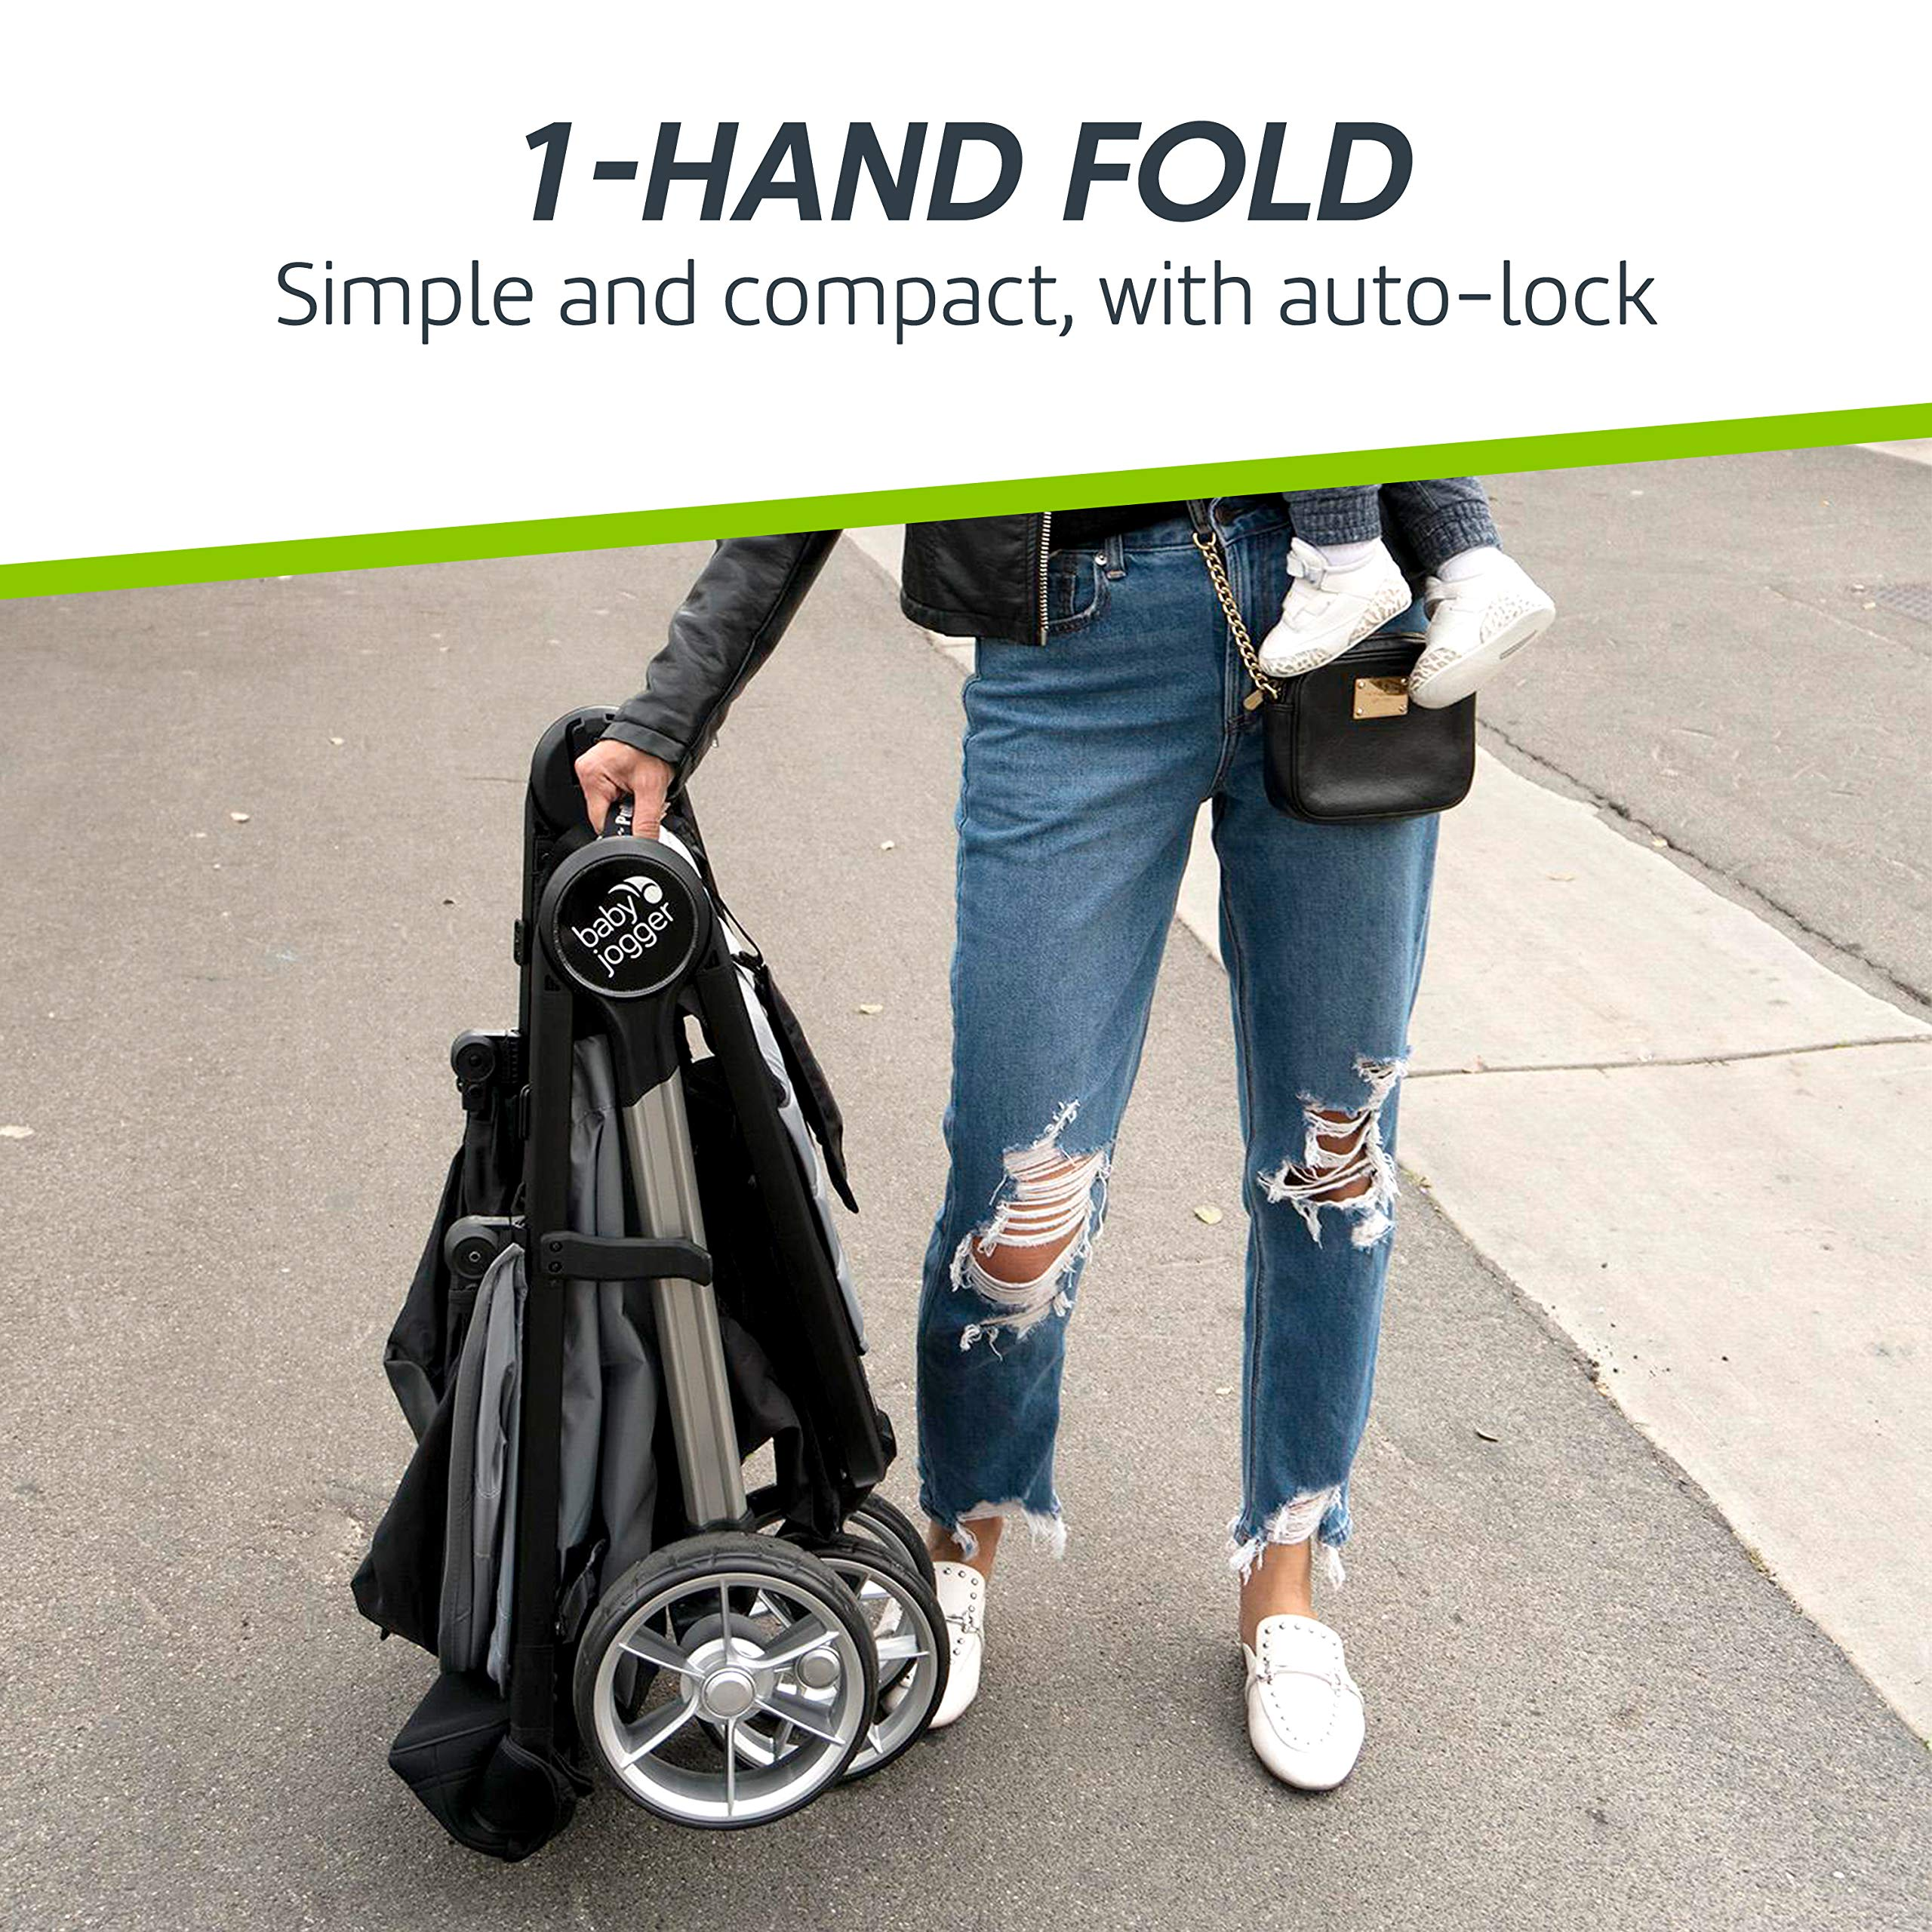 Baby Jogger City Mini 2 Stroller - 2019   Compact, Lightweight Stroller   Quick Fold Baby Stroller, Carbon by Baby Jogger (Image #4)